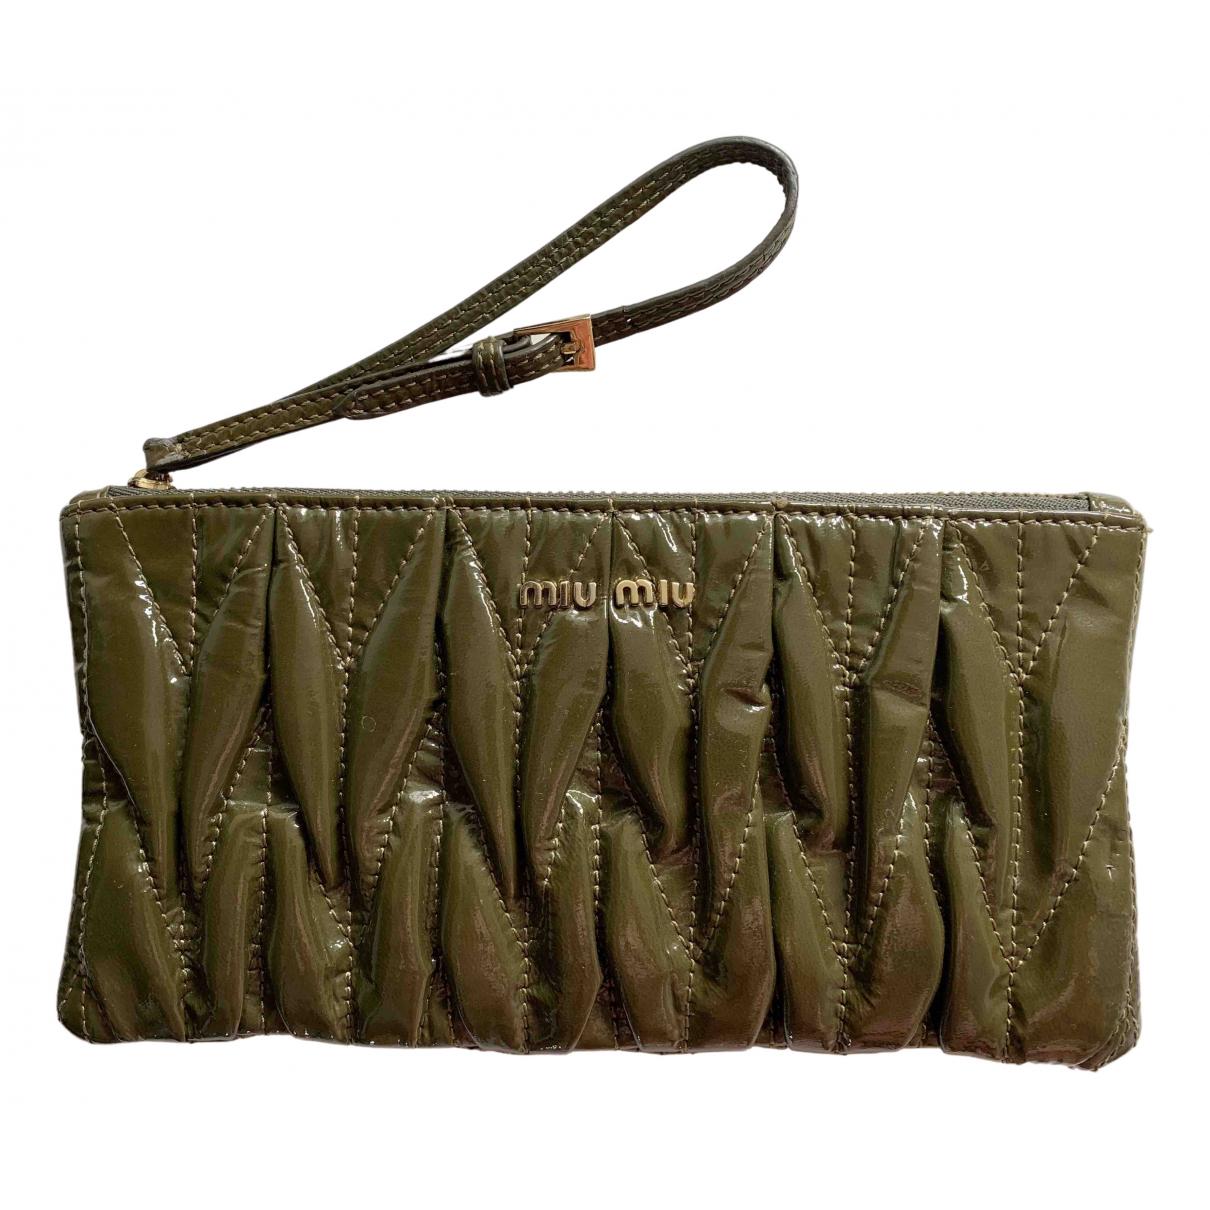 Miu Miu N Green Patent leather Clutch bag for Women N